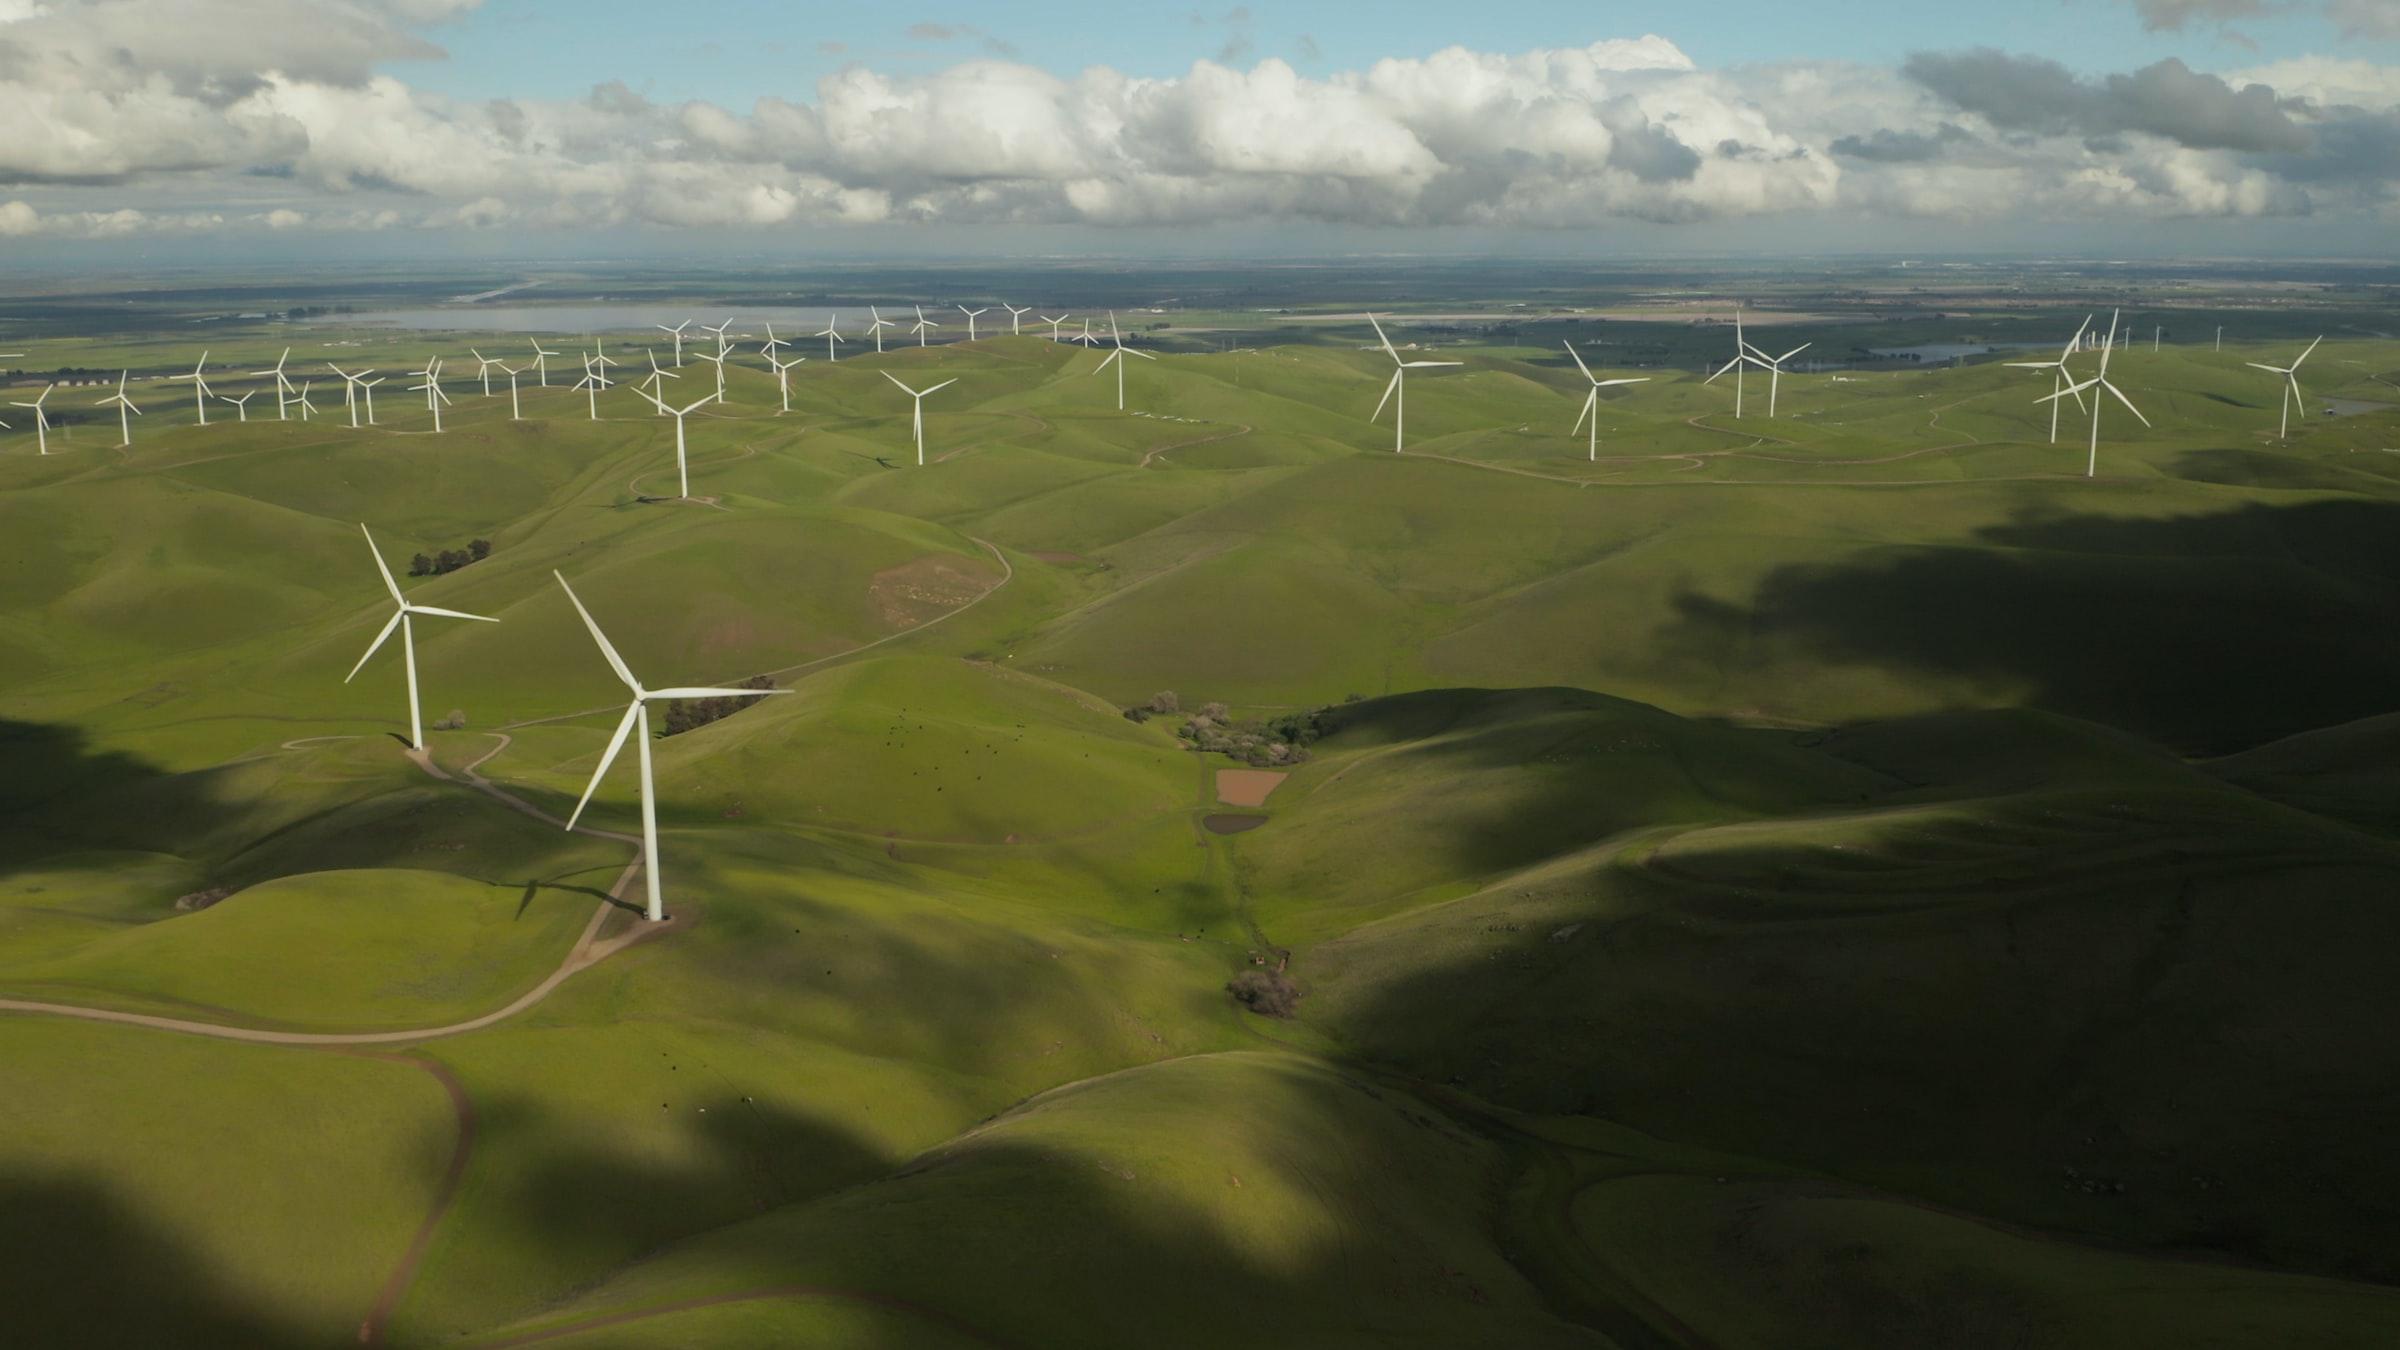 Haliade-X wind turbine reaches landmark 14MW output